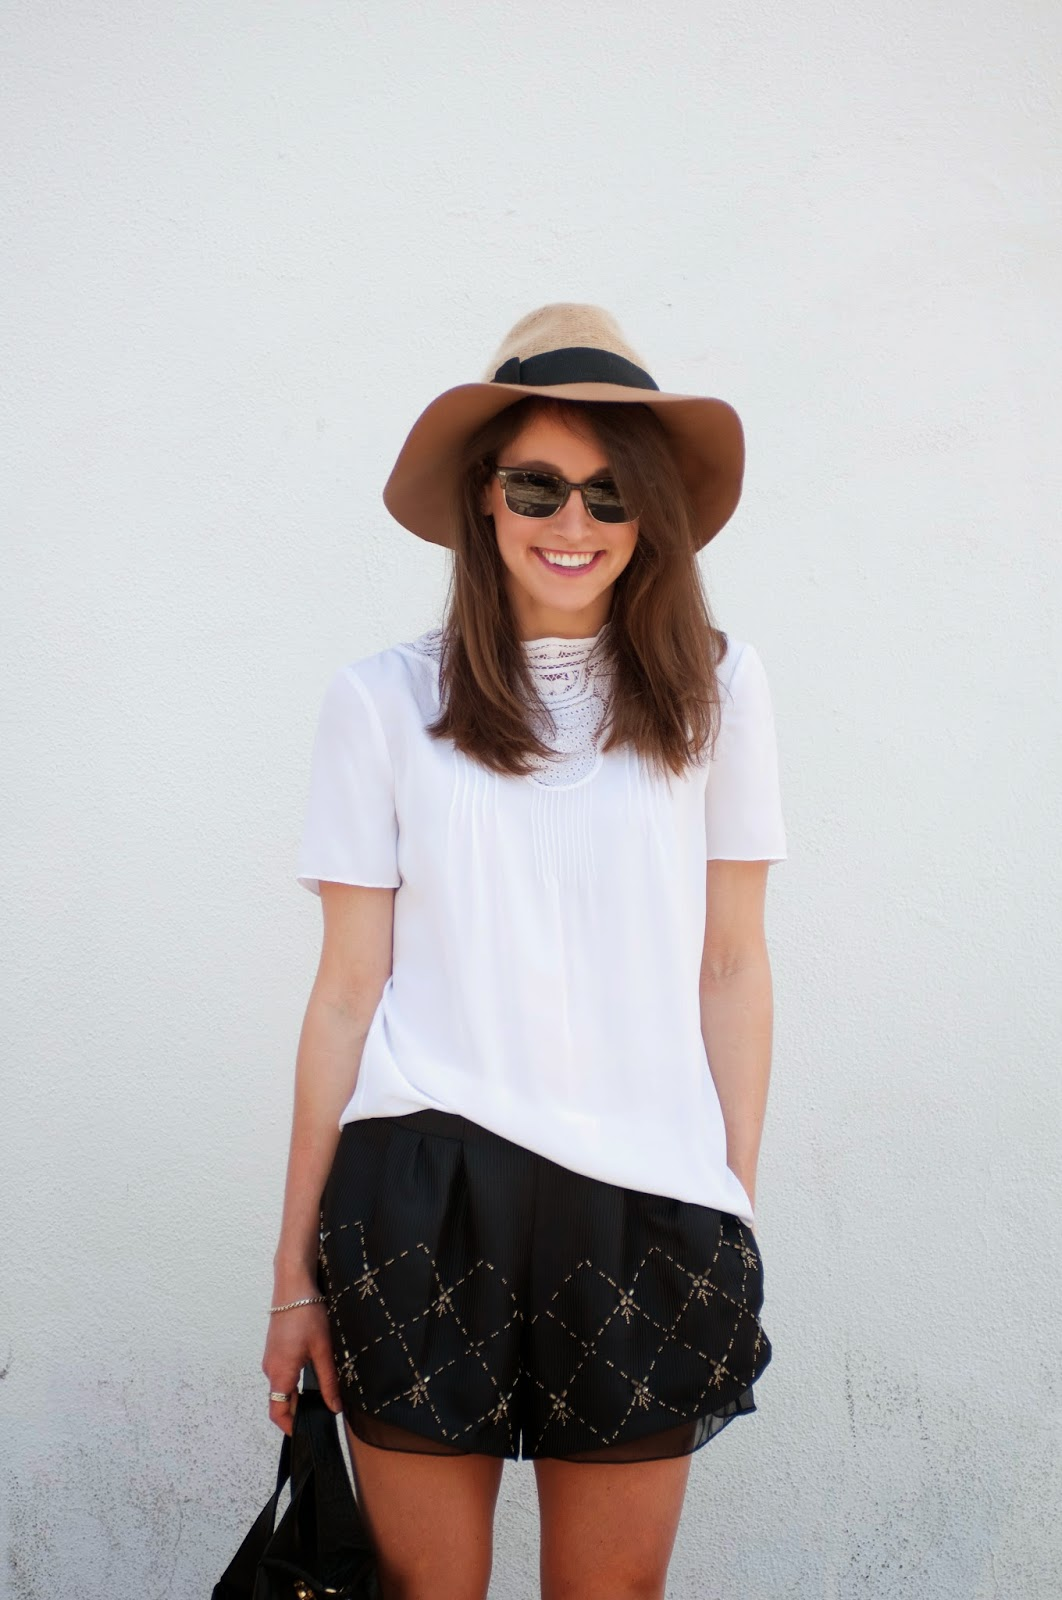 warby-parker-wayfarer-sunglasses